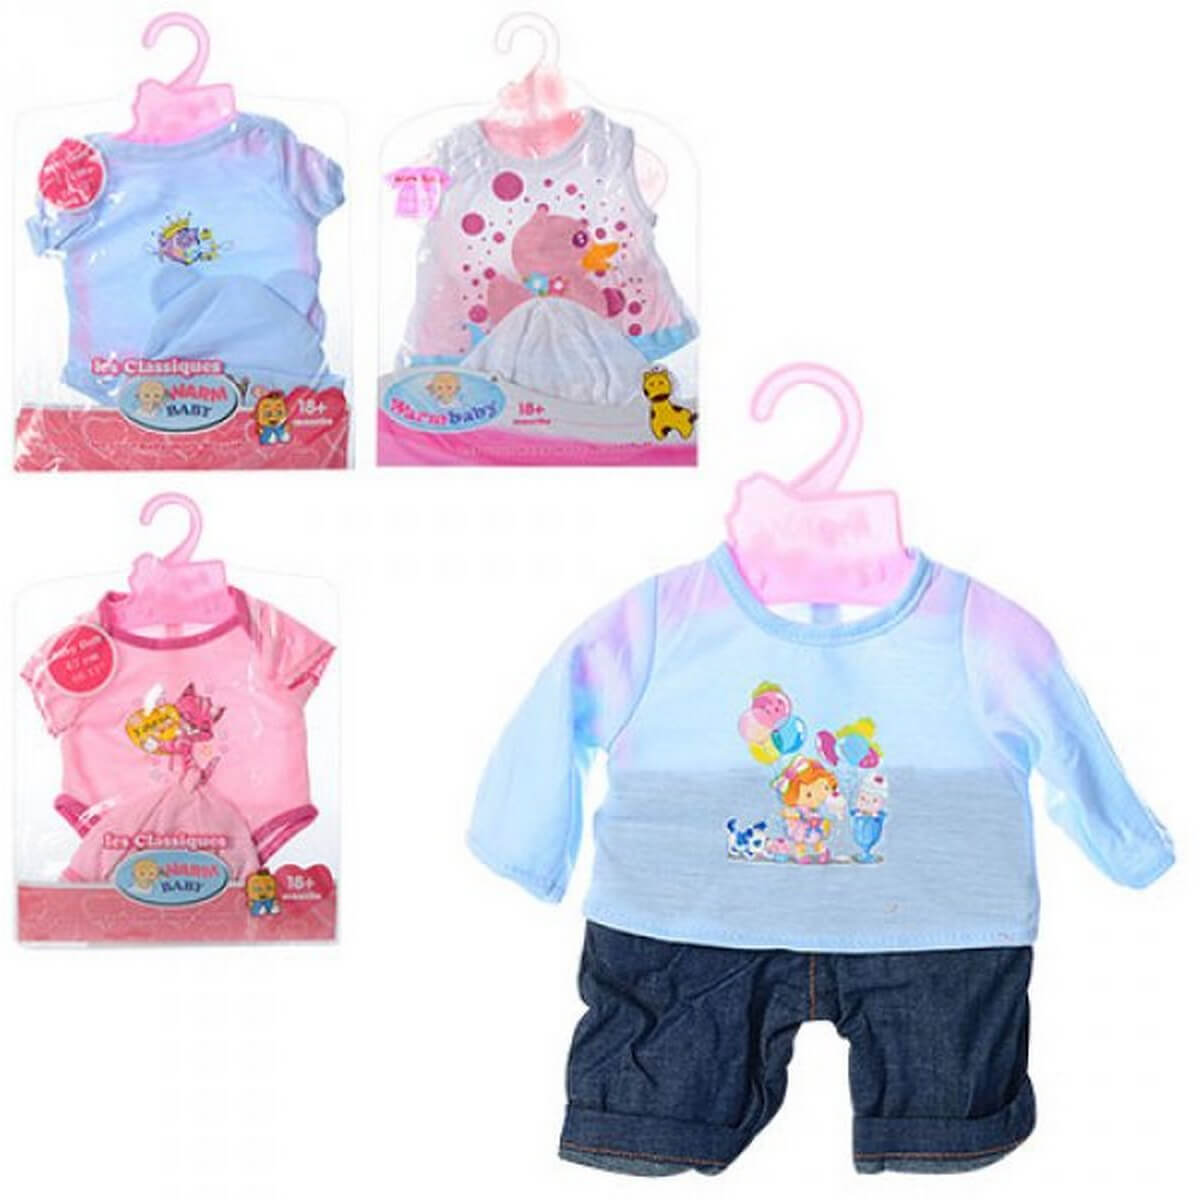 baby doll Кукольный наряд 4 вида для пупса DBJ-9005B-68A